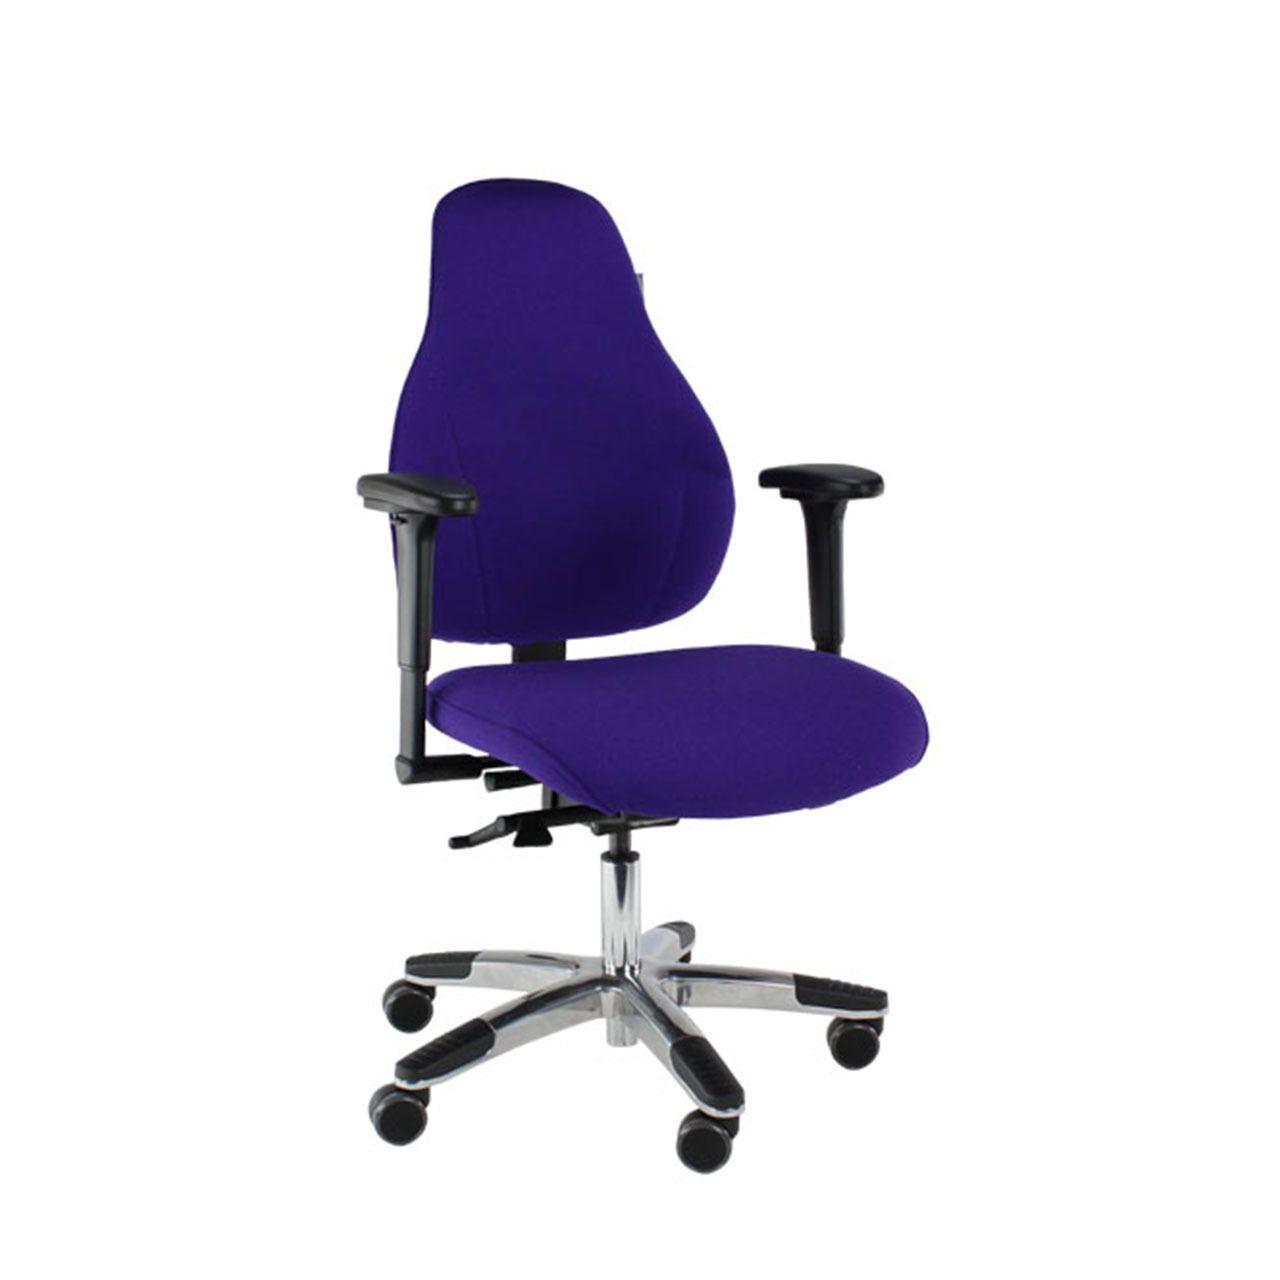 Score 5100 large bureaustoel STKAS510 L 0000 Voorkant